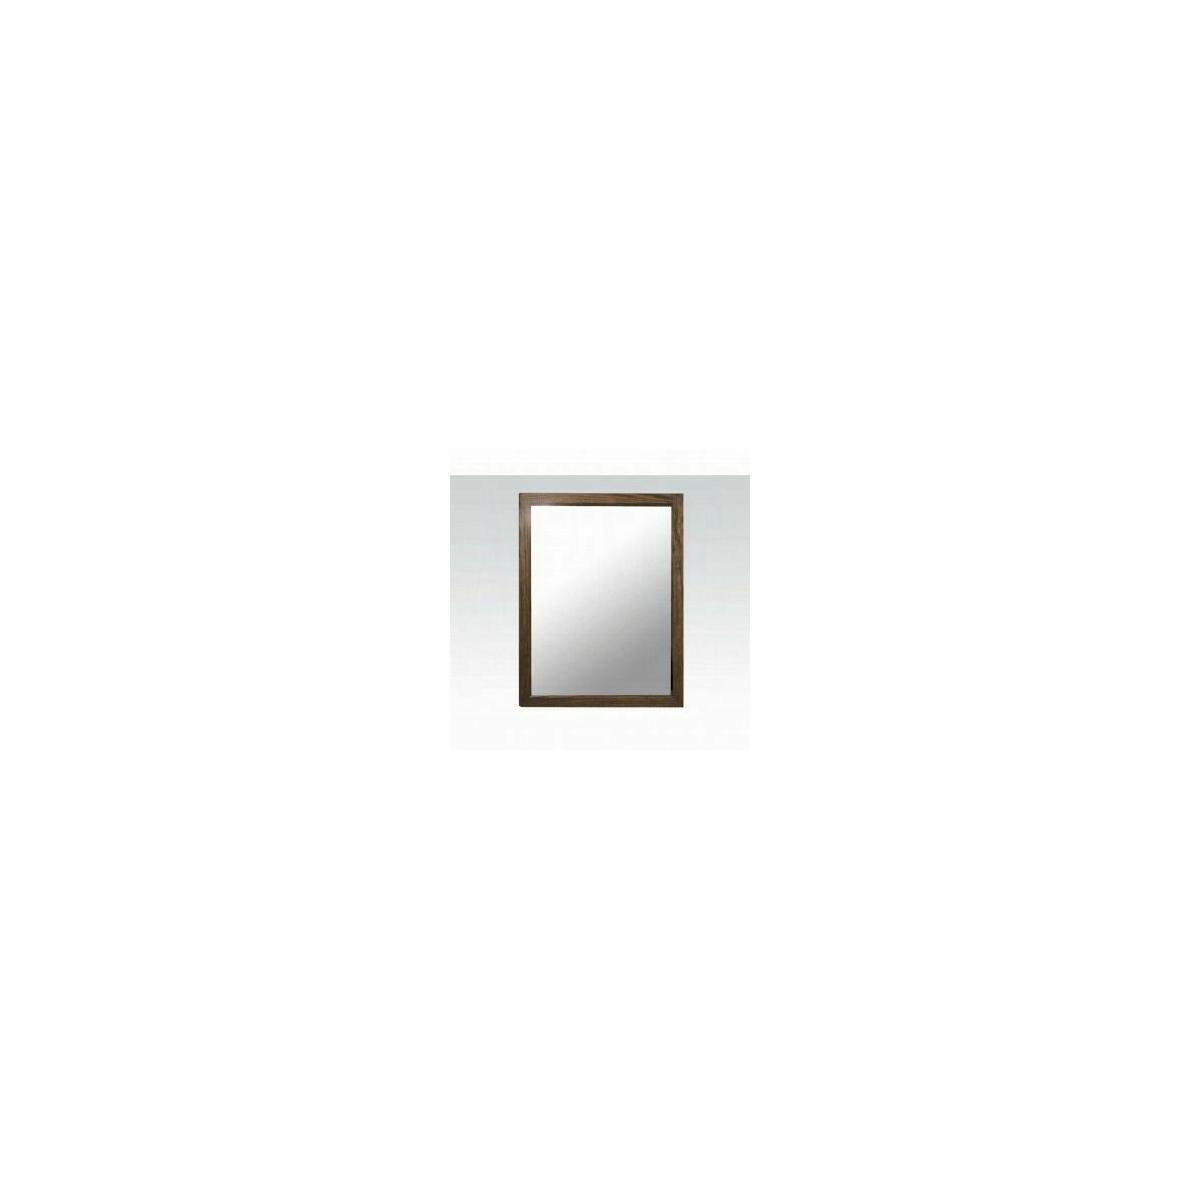 ACME Landon Mirror - 60739 - Salvage Brown